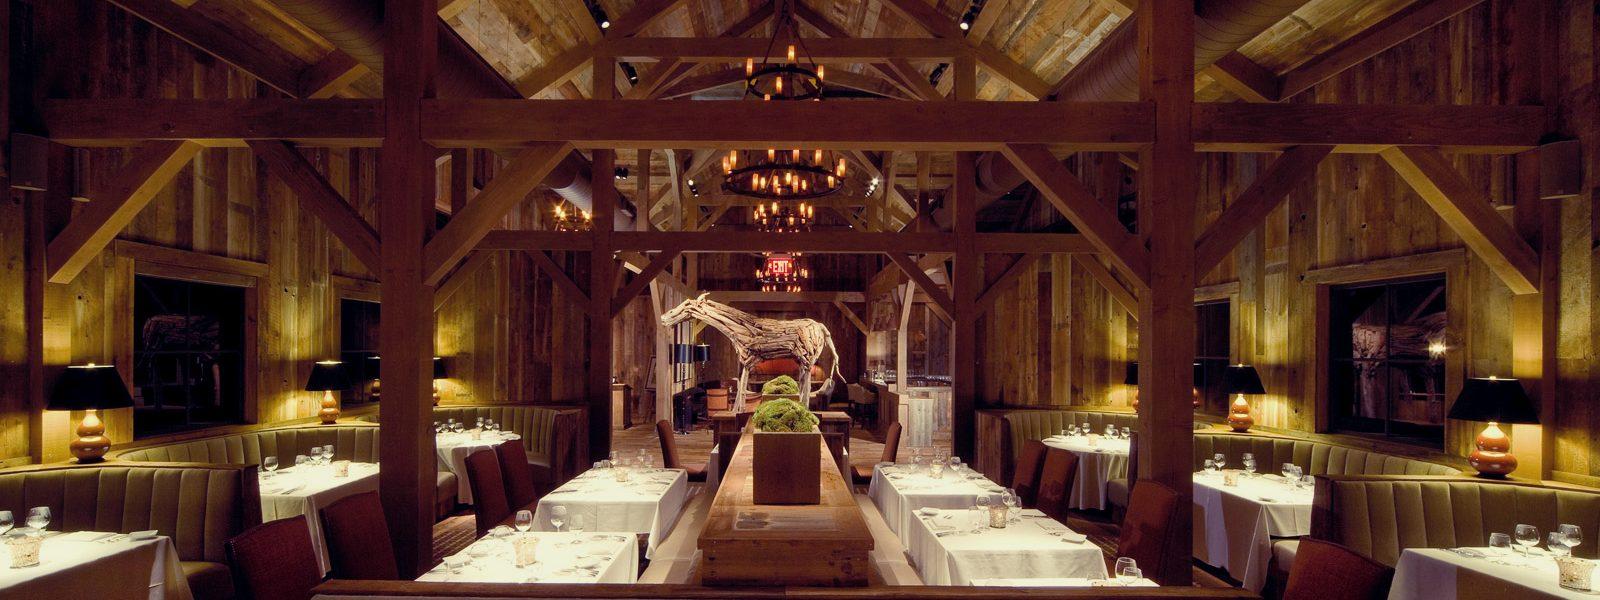 Restaurants In Banner Elk Nc Artisanal